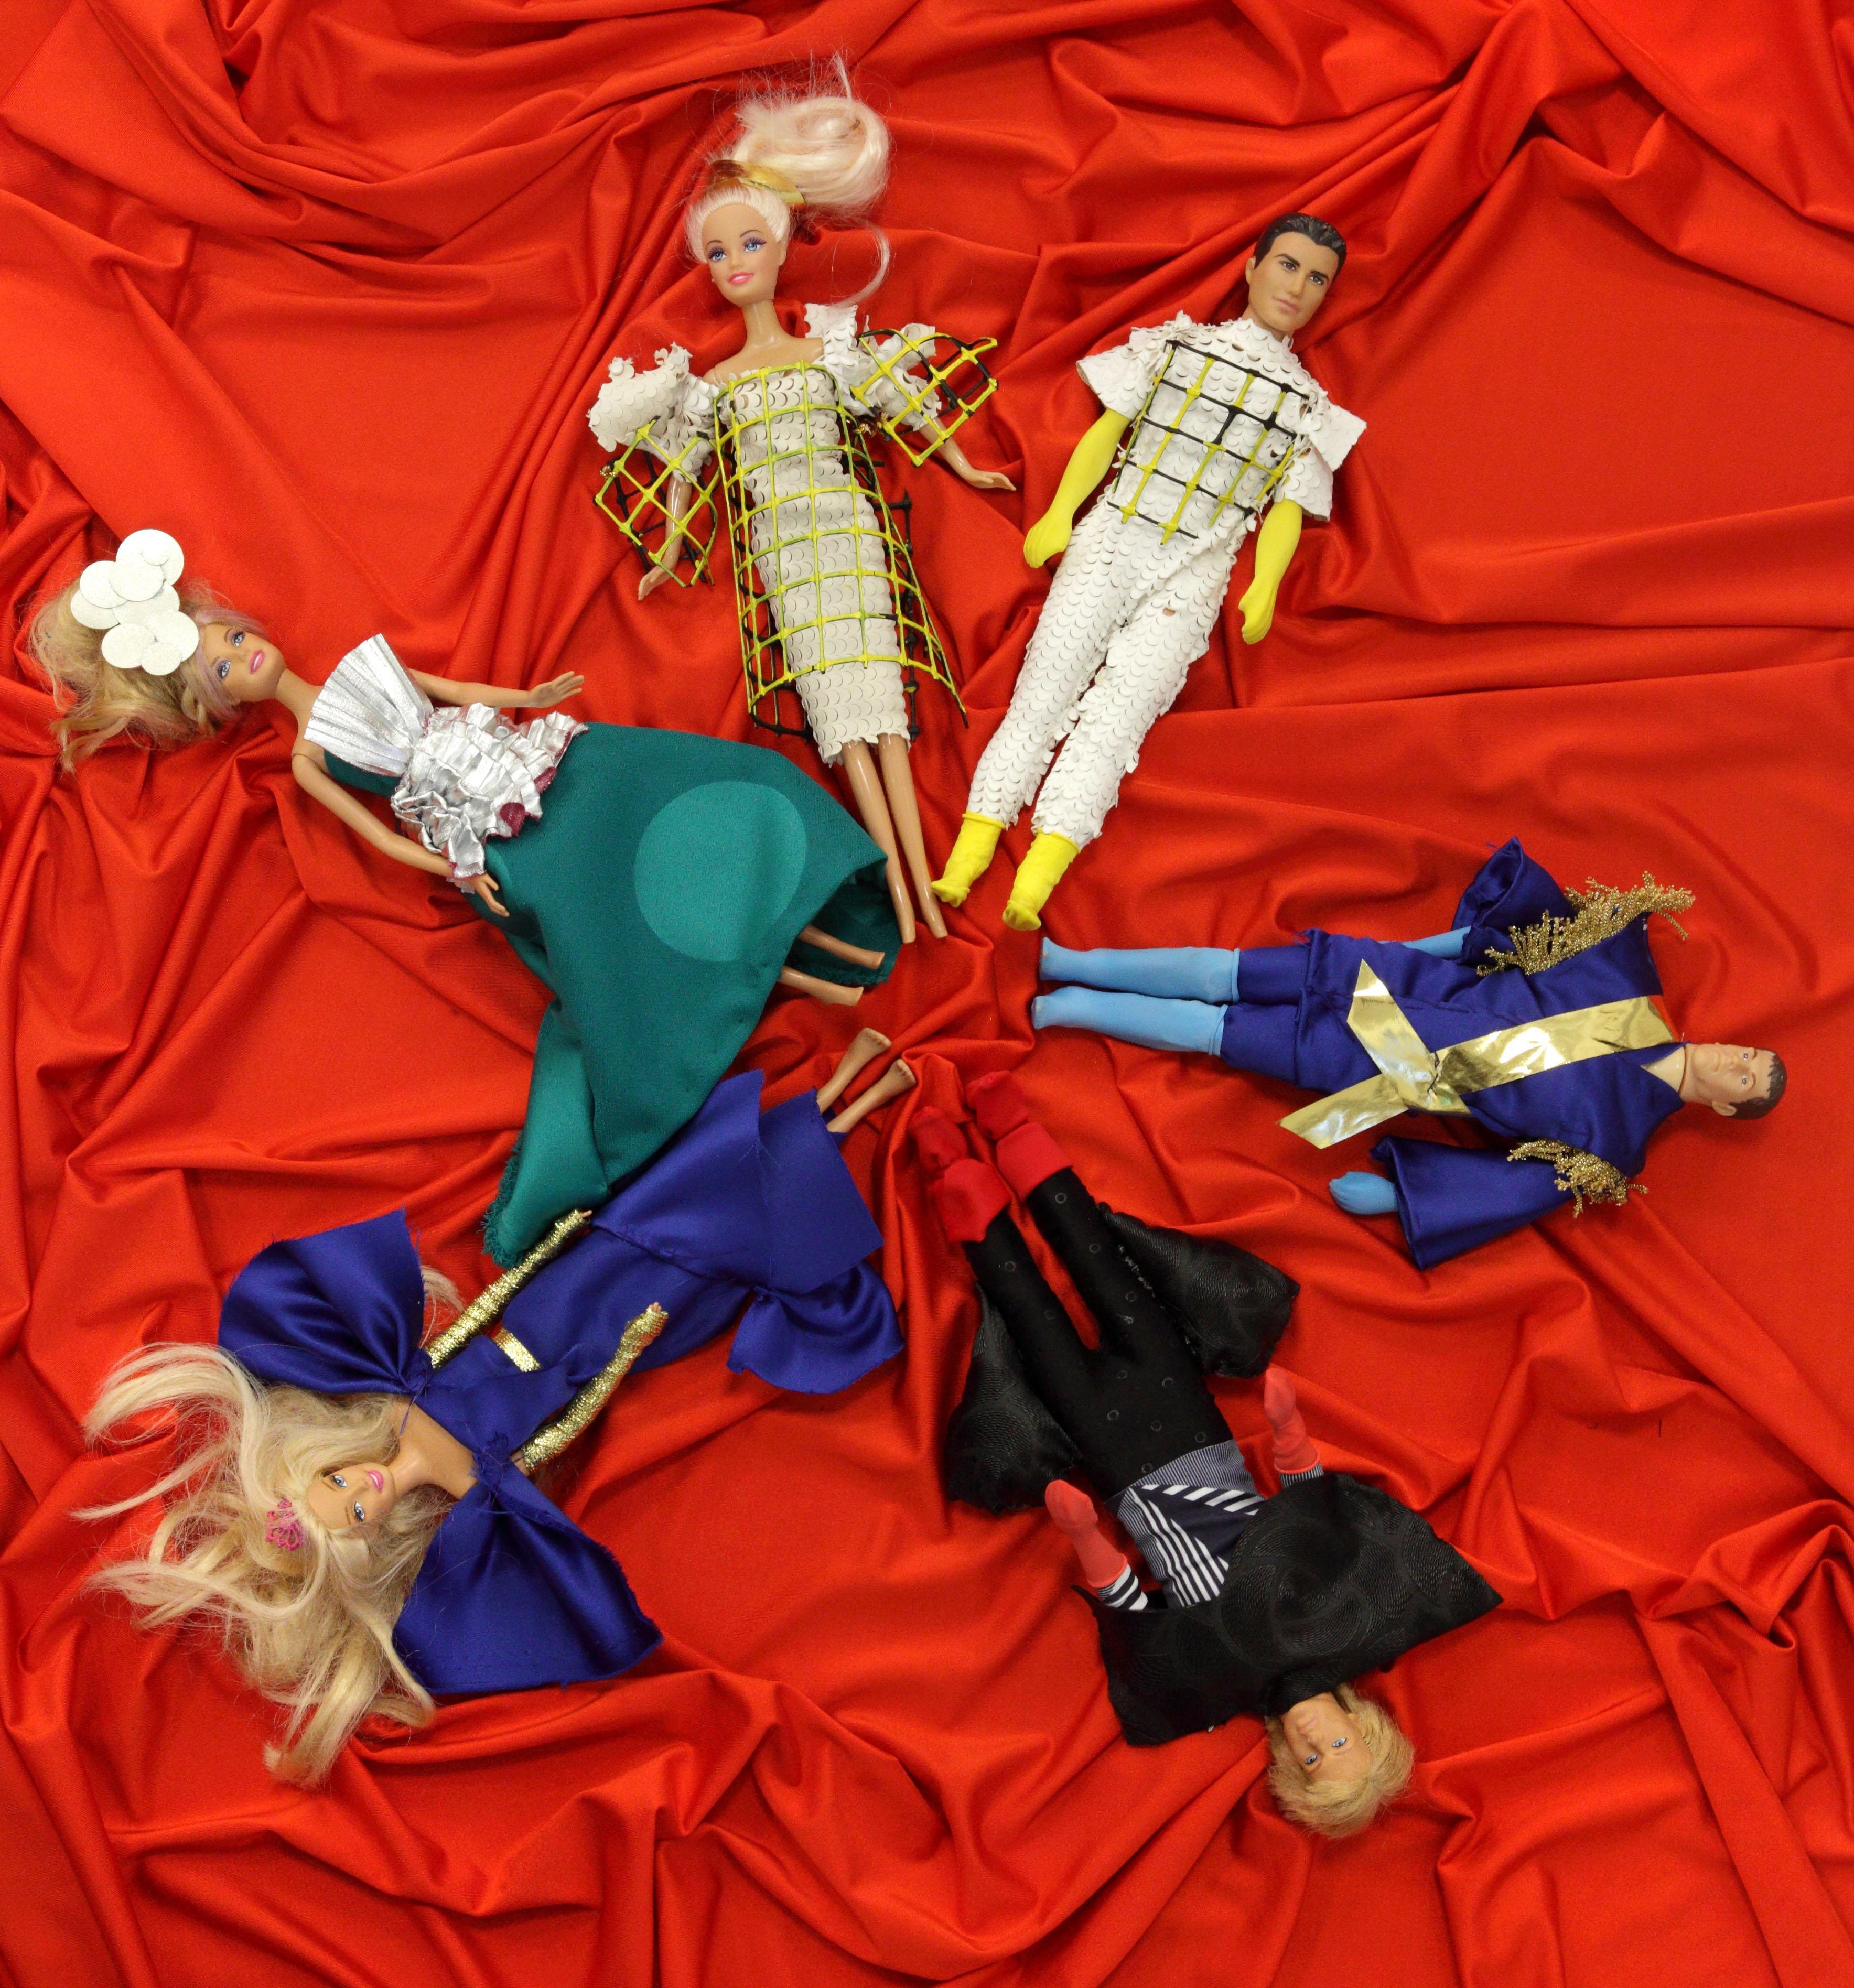 H πριγκίπισσα και το μπιζέλι - μακέτες κοστουμιών Ιωάννας Τσάμη_φωτό Γ. Δομένικος - Αντίγραφο